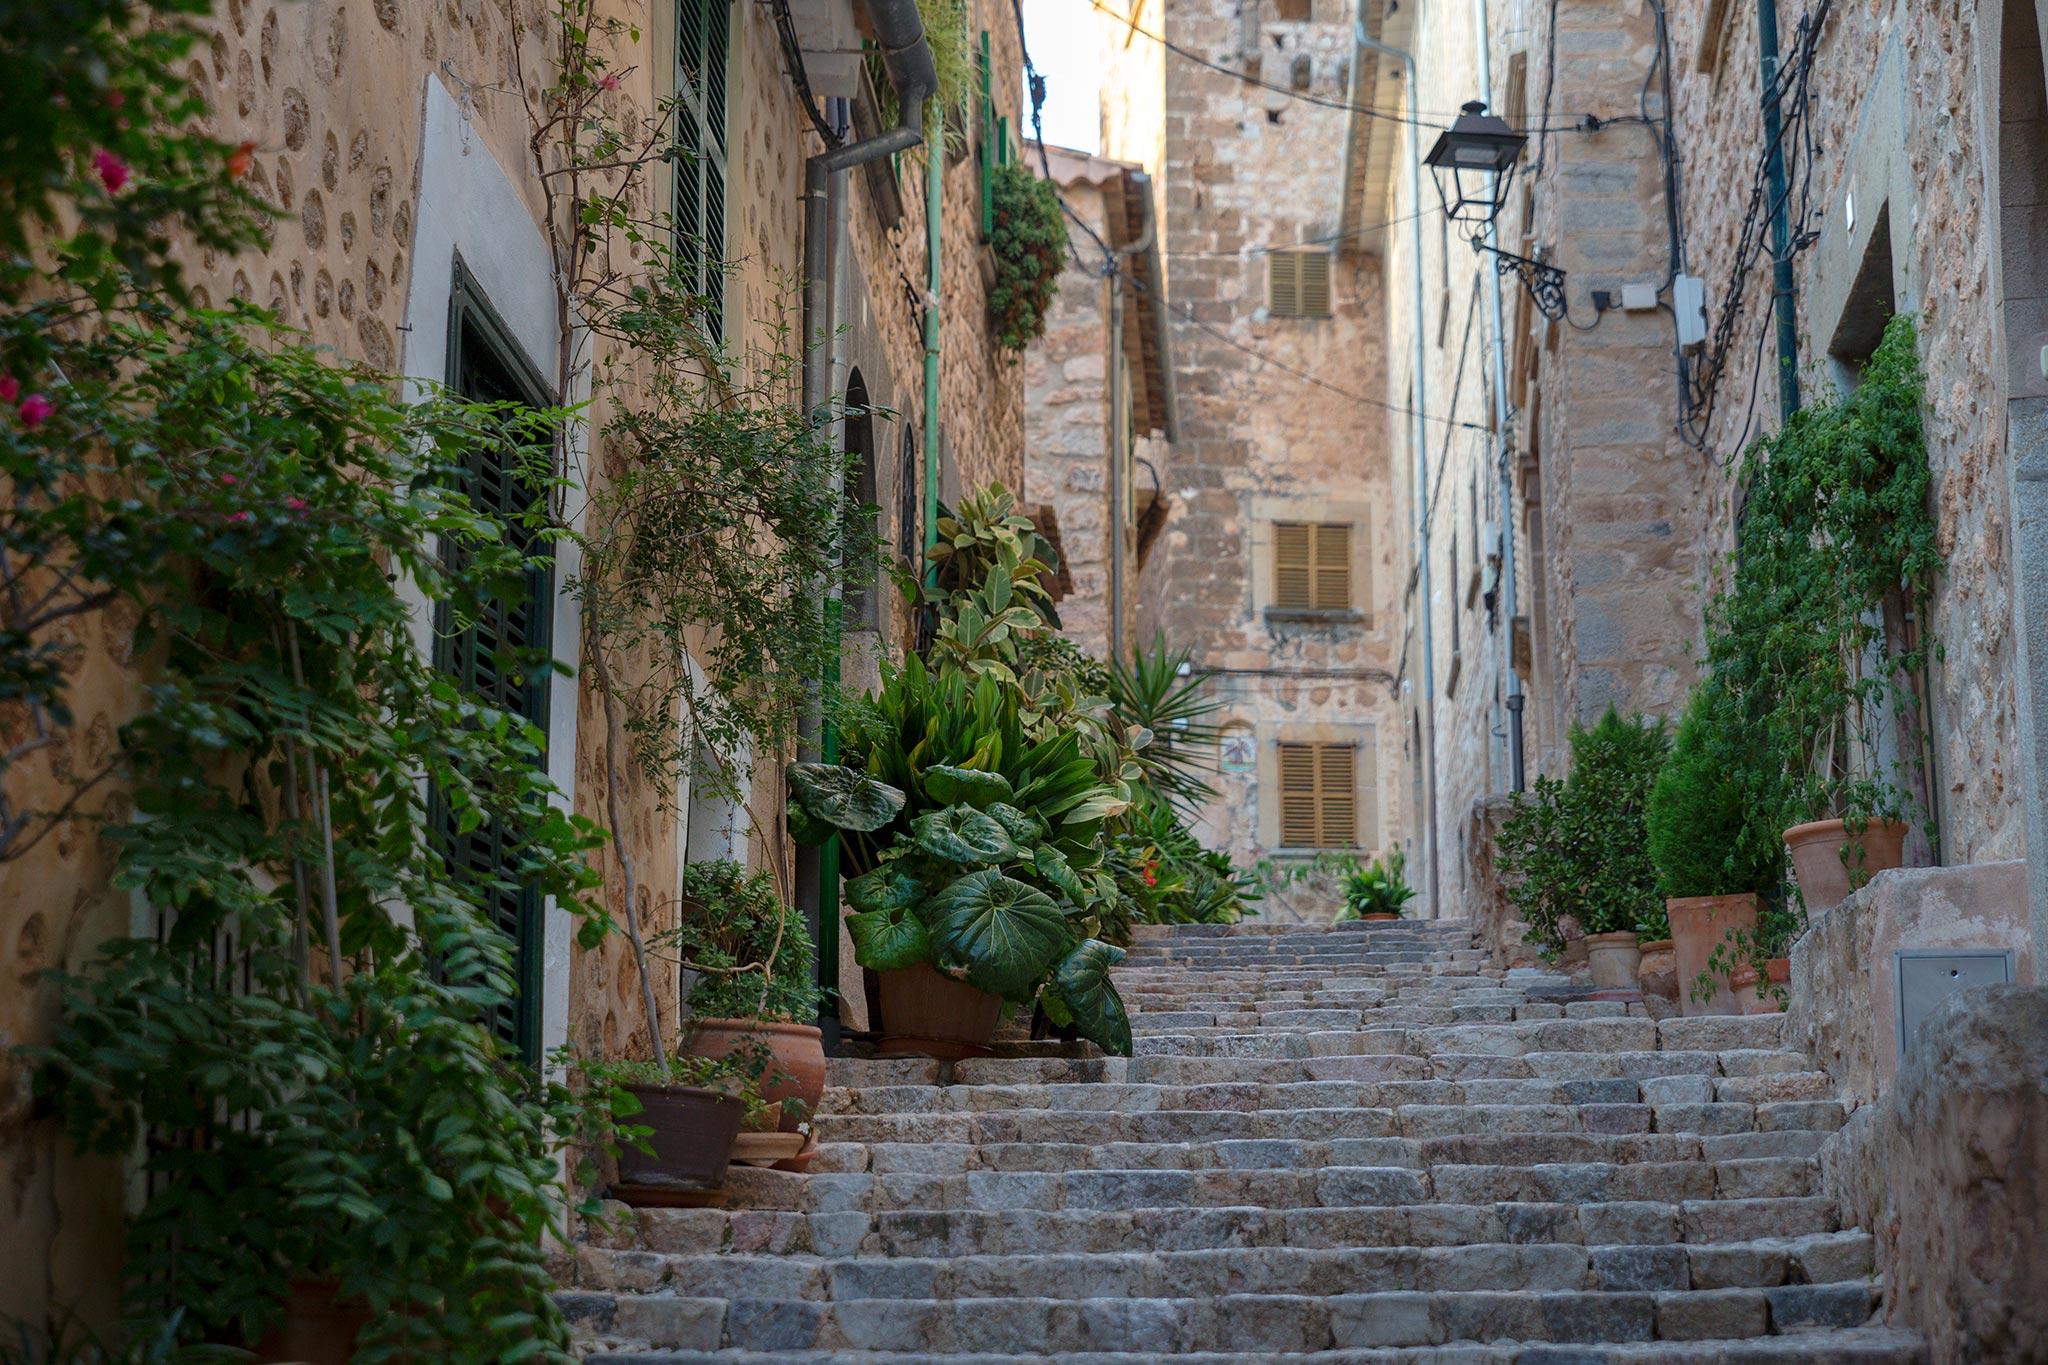 Fornalutx, Mallorca © Tuulia Kolehmainen